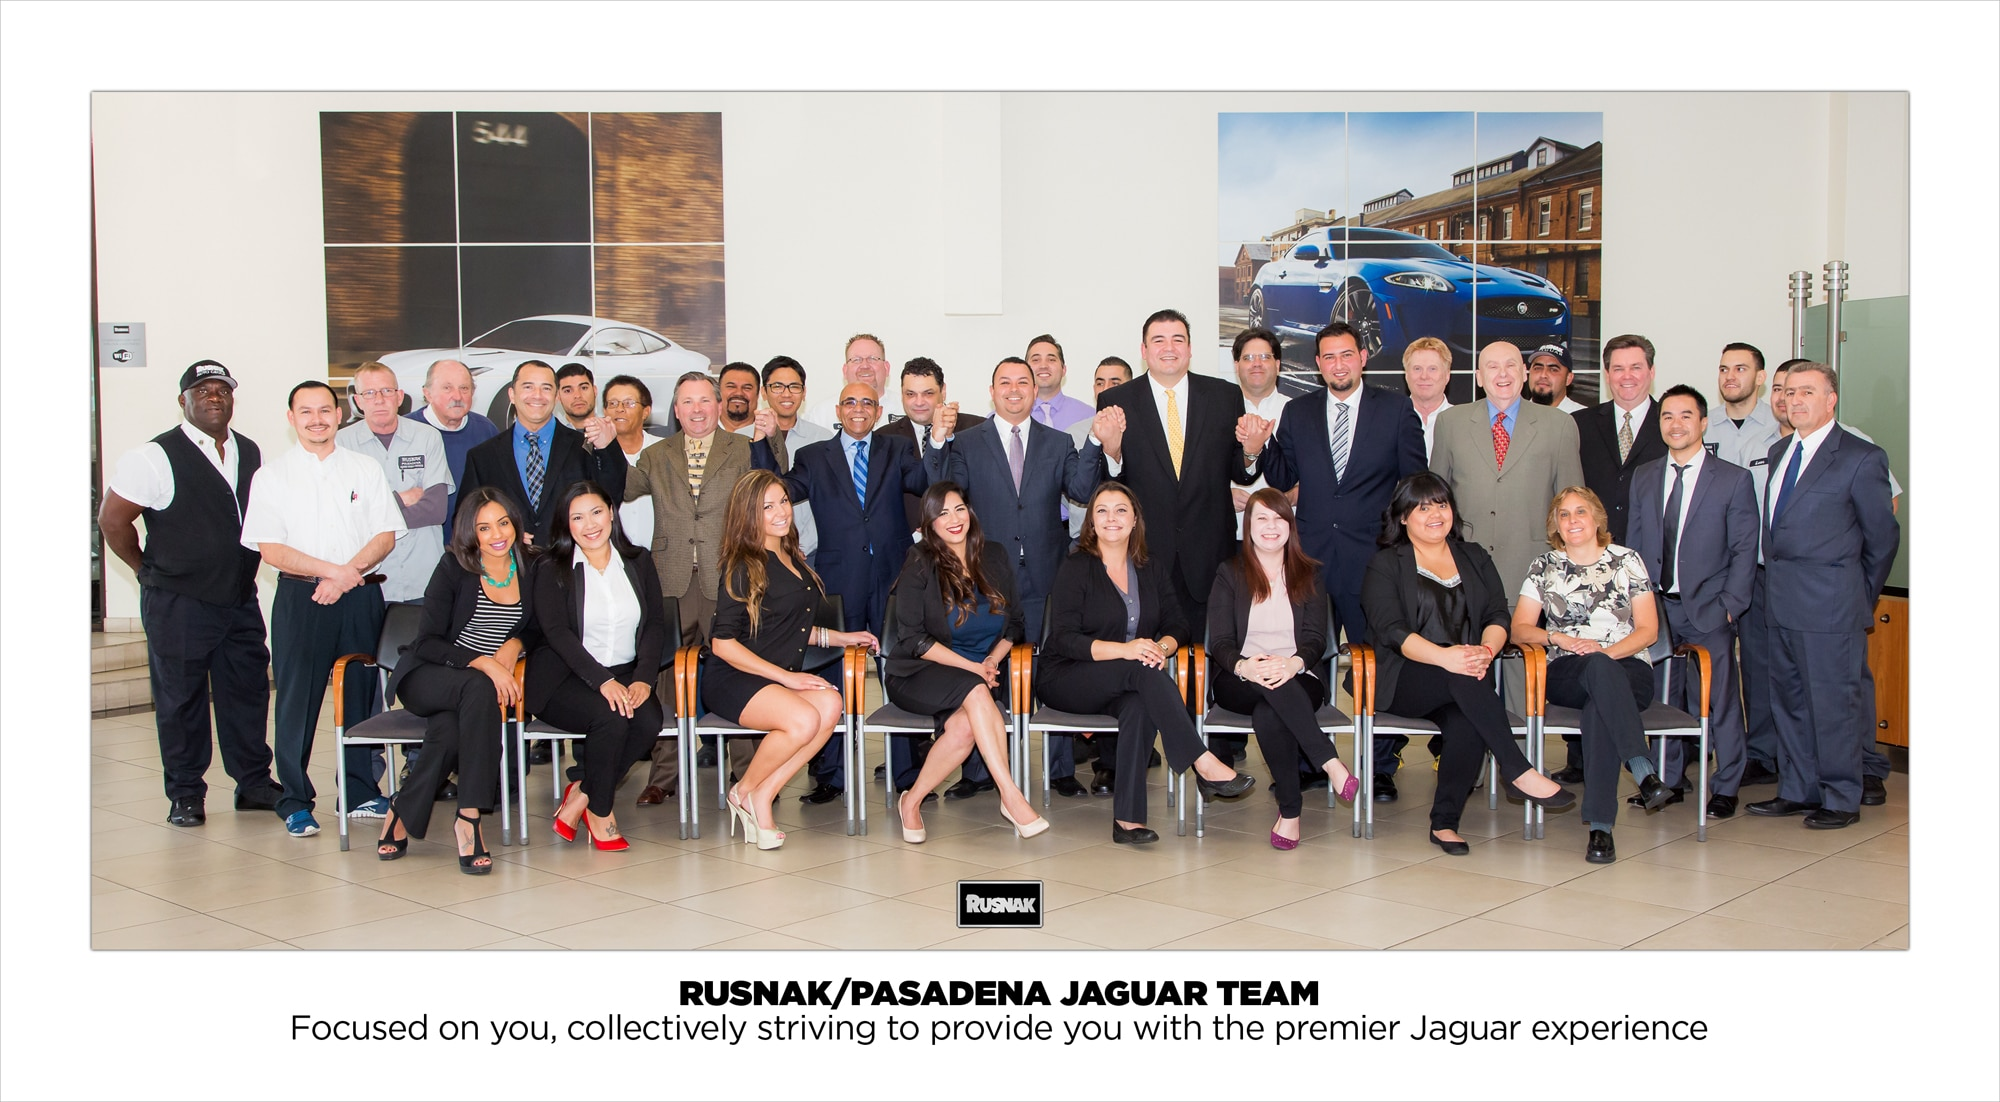 About Rusnak Pasadena Jaguar near Los Angeles & Beverly Hills